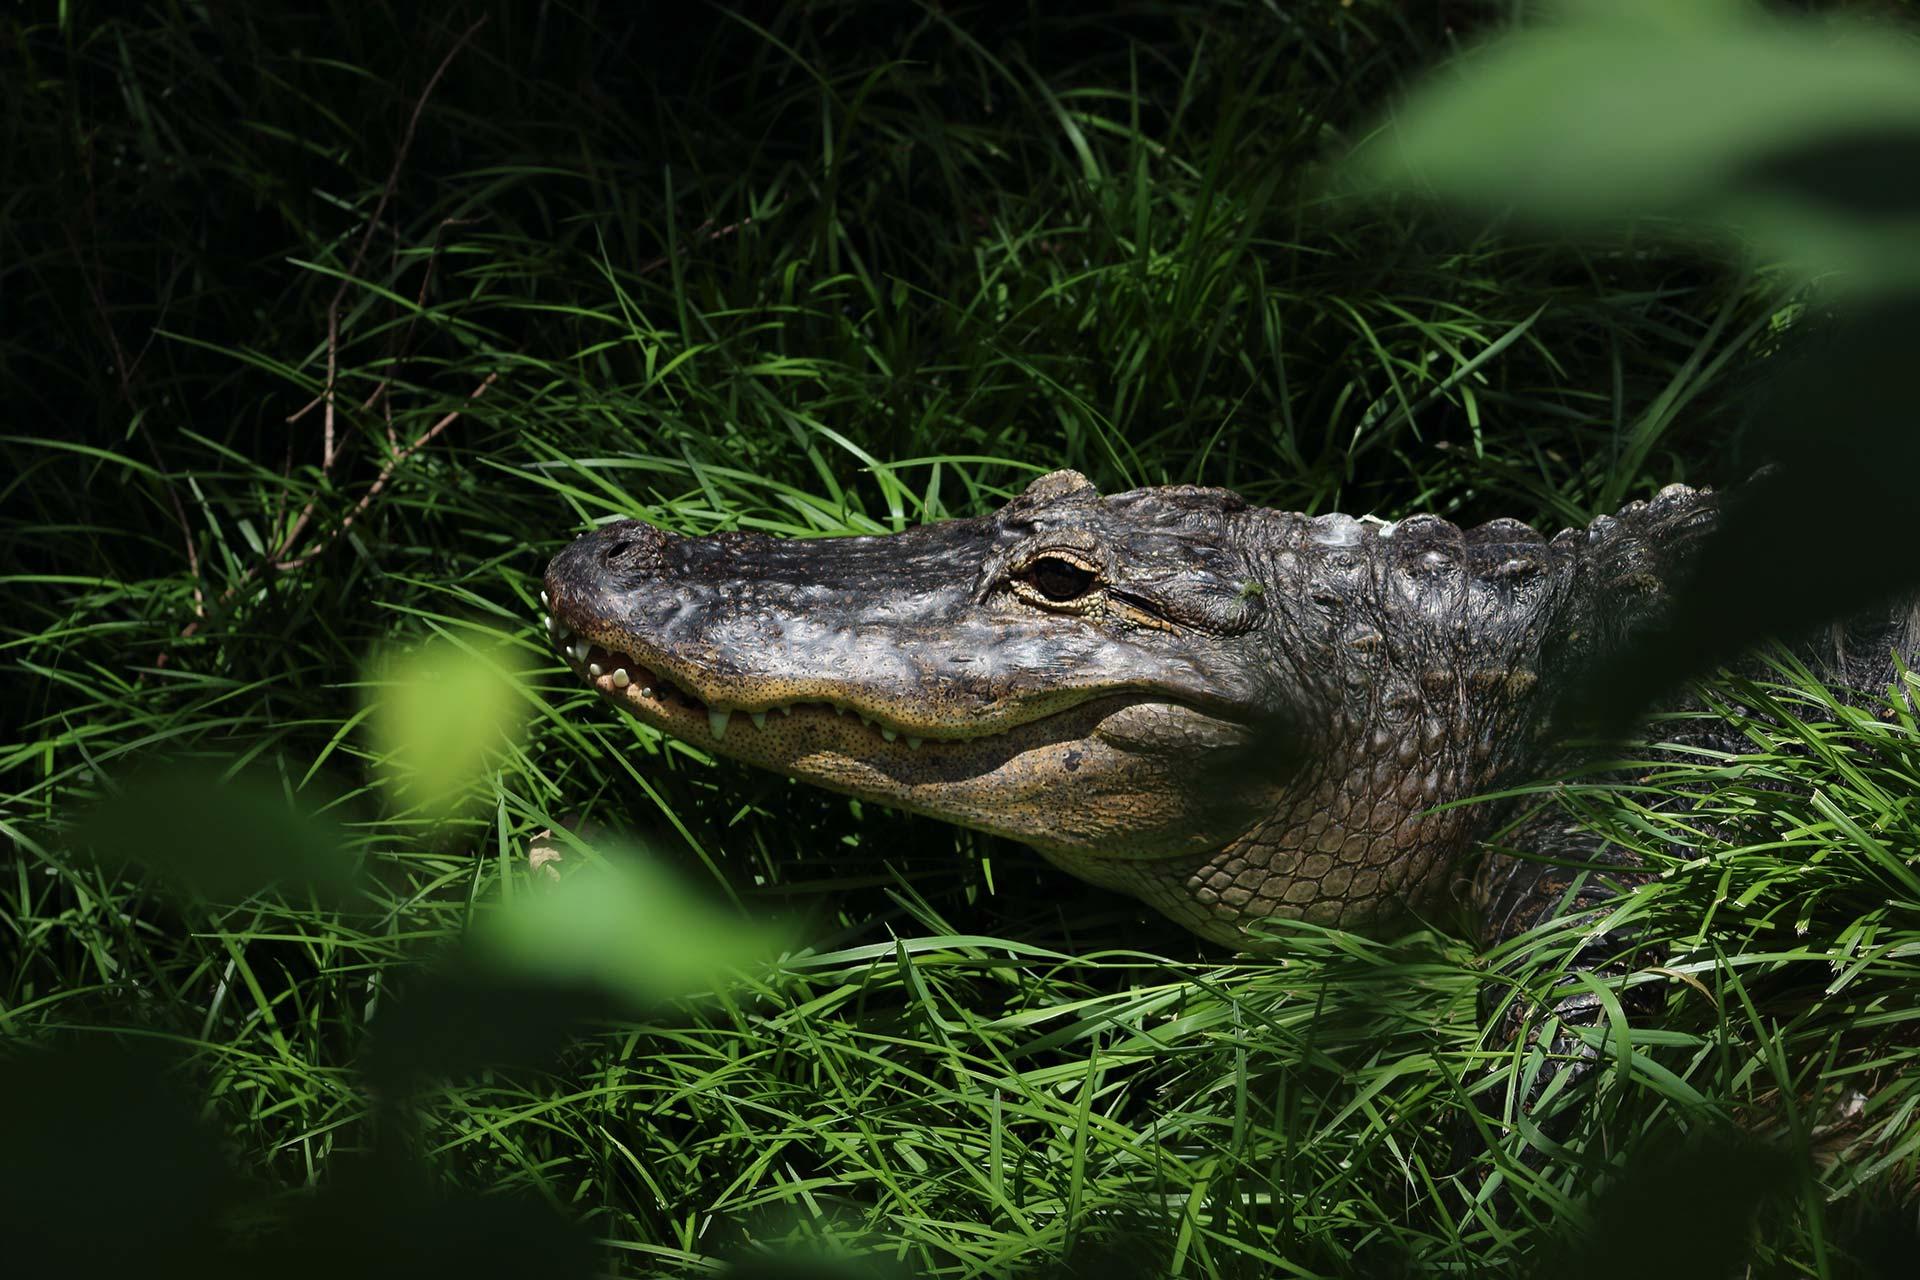 Crocodile dans l'herbe